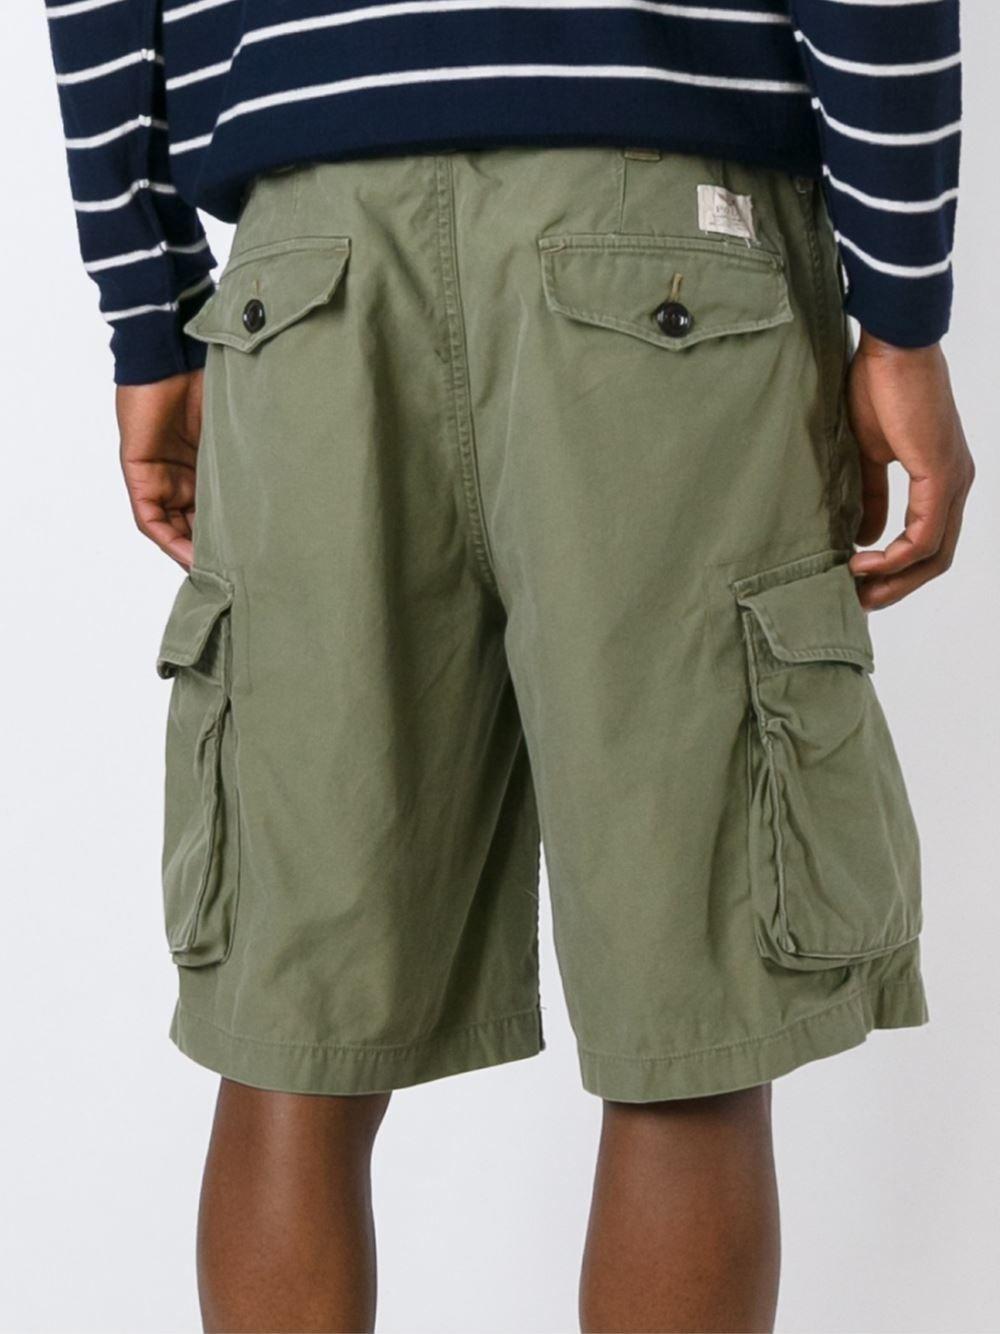 67d4528e35 canada polo ralph lauren cargo shorts sale 82c22 78d0b